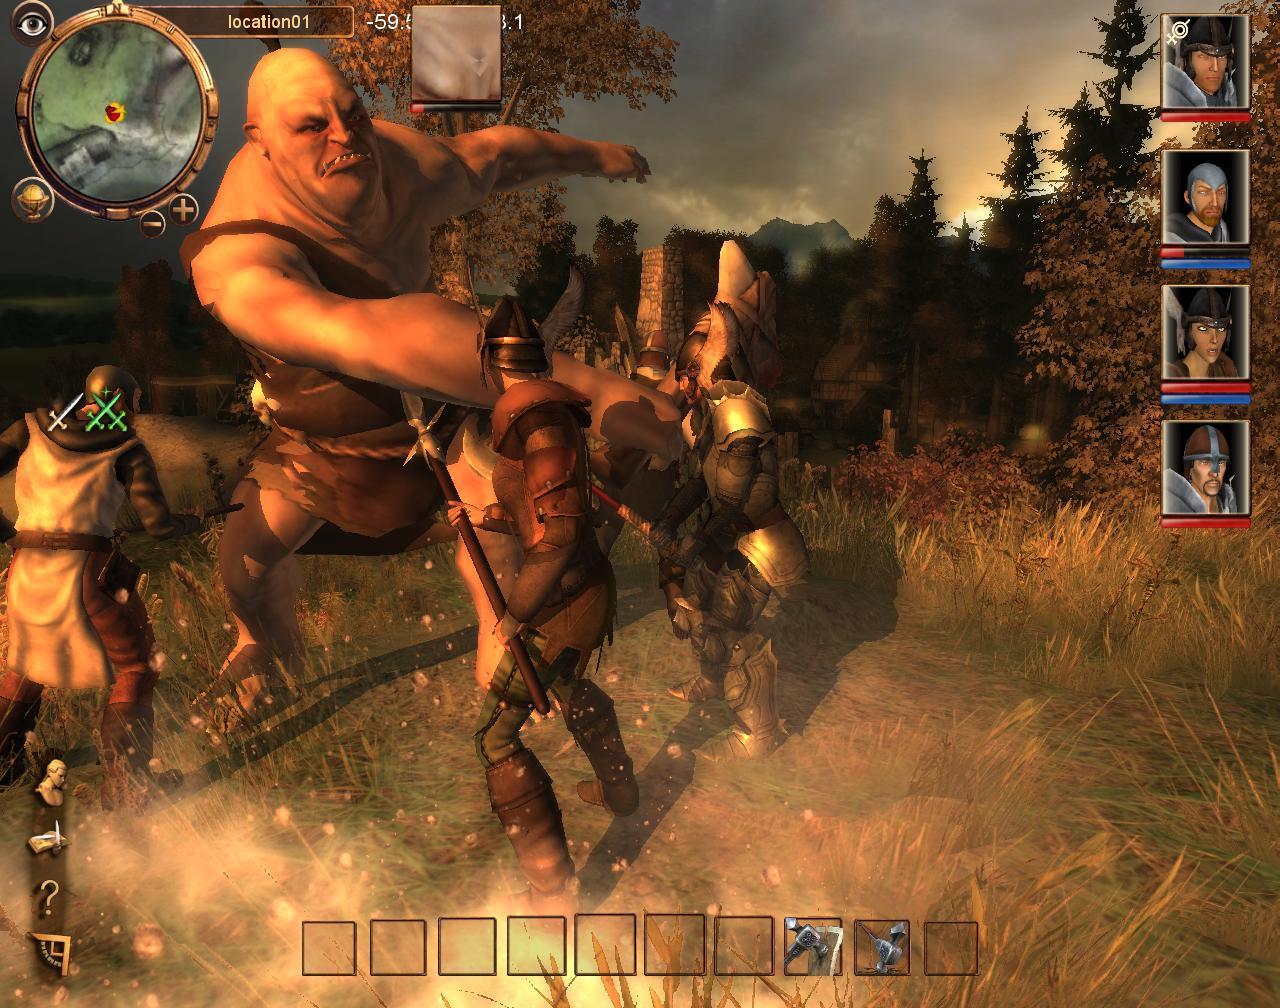 3d Home Wallpaper For Pc Drakensang Free Multiplayer Online Games